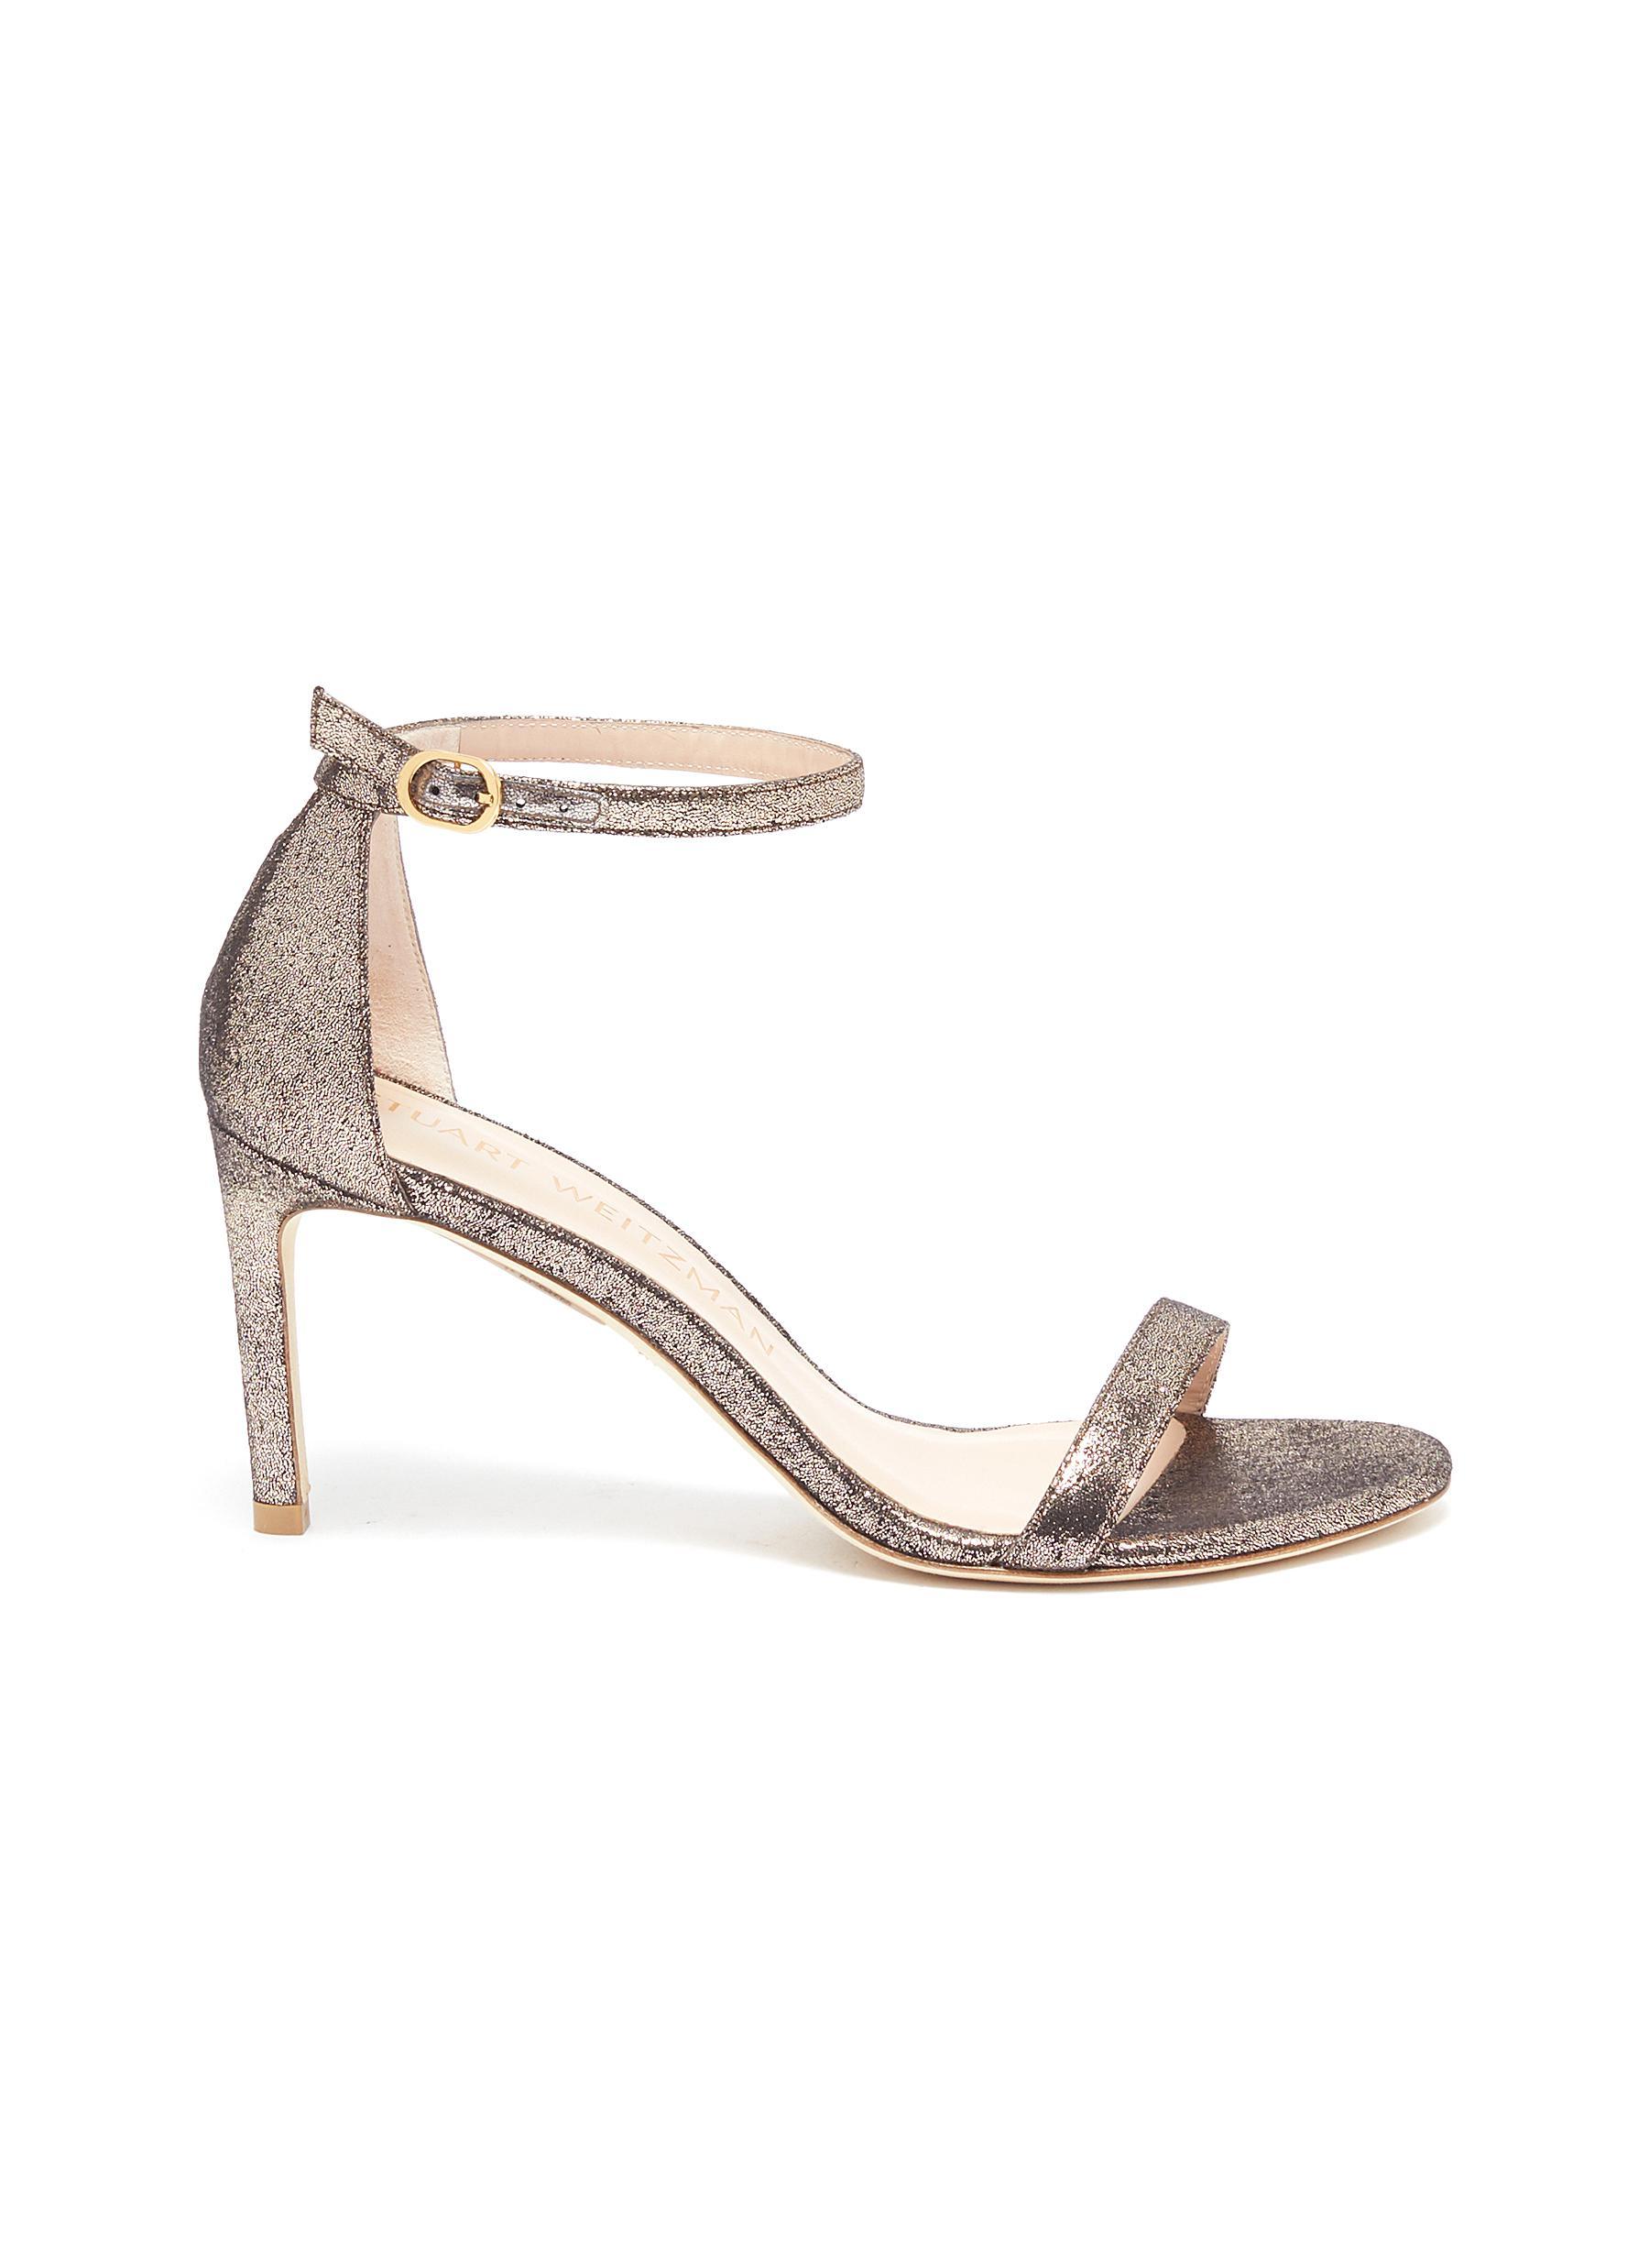 Stuart Weitzman High Heels Nunakedstraight glittered heeled sandals